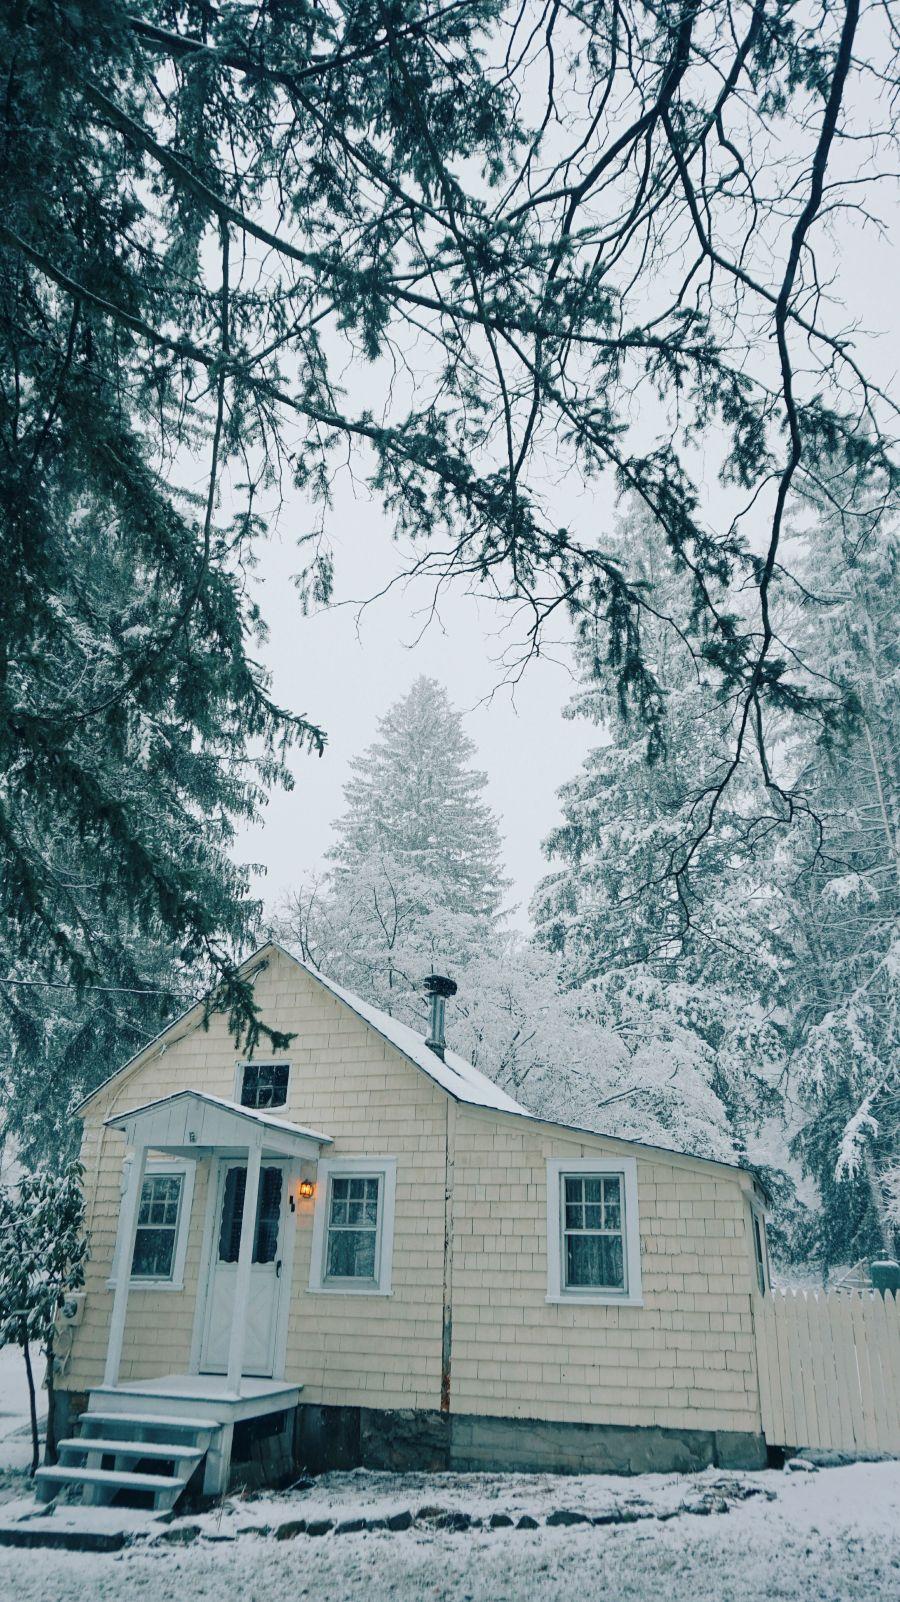 winter in new york 17-18